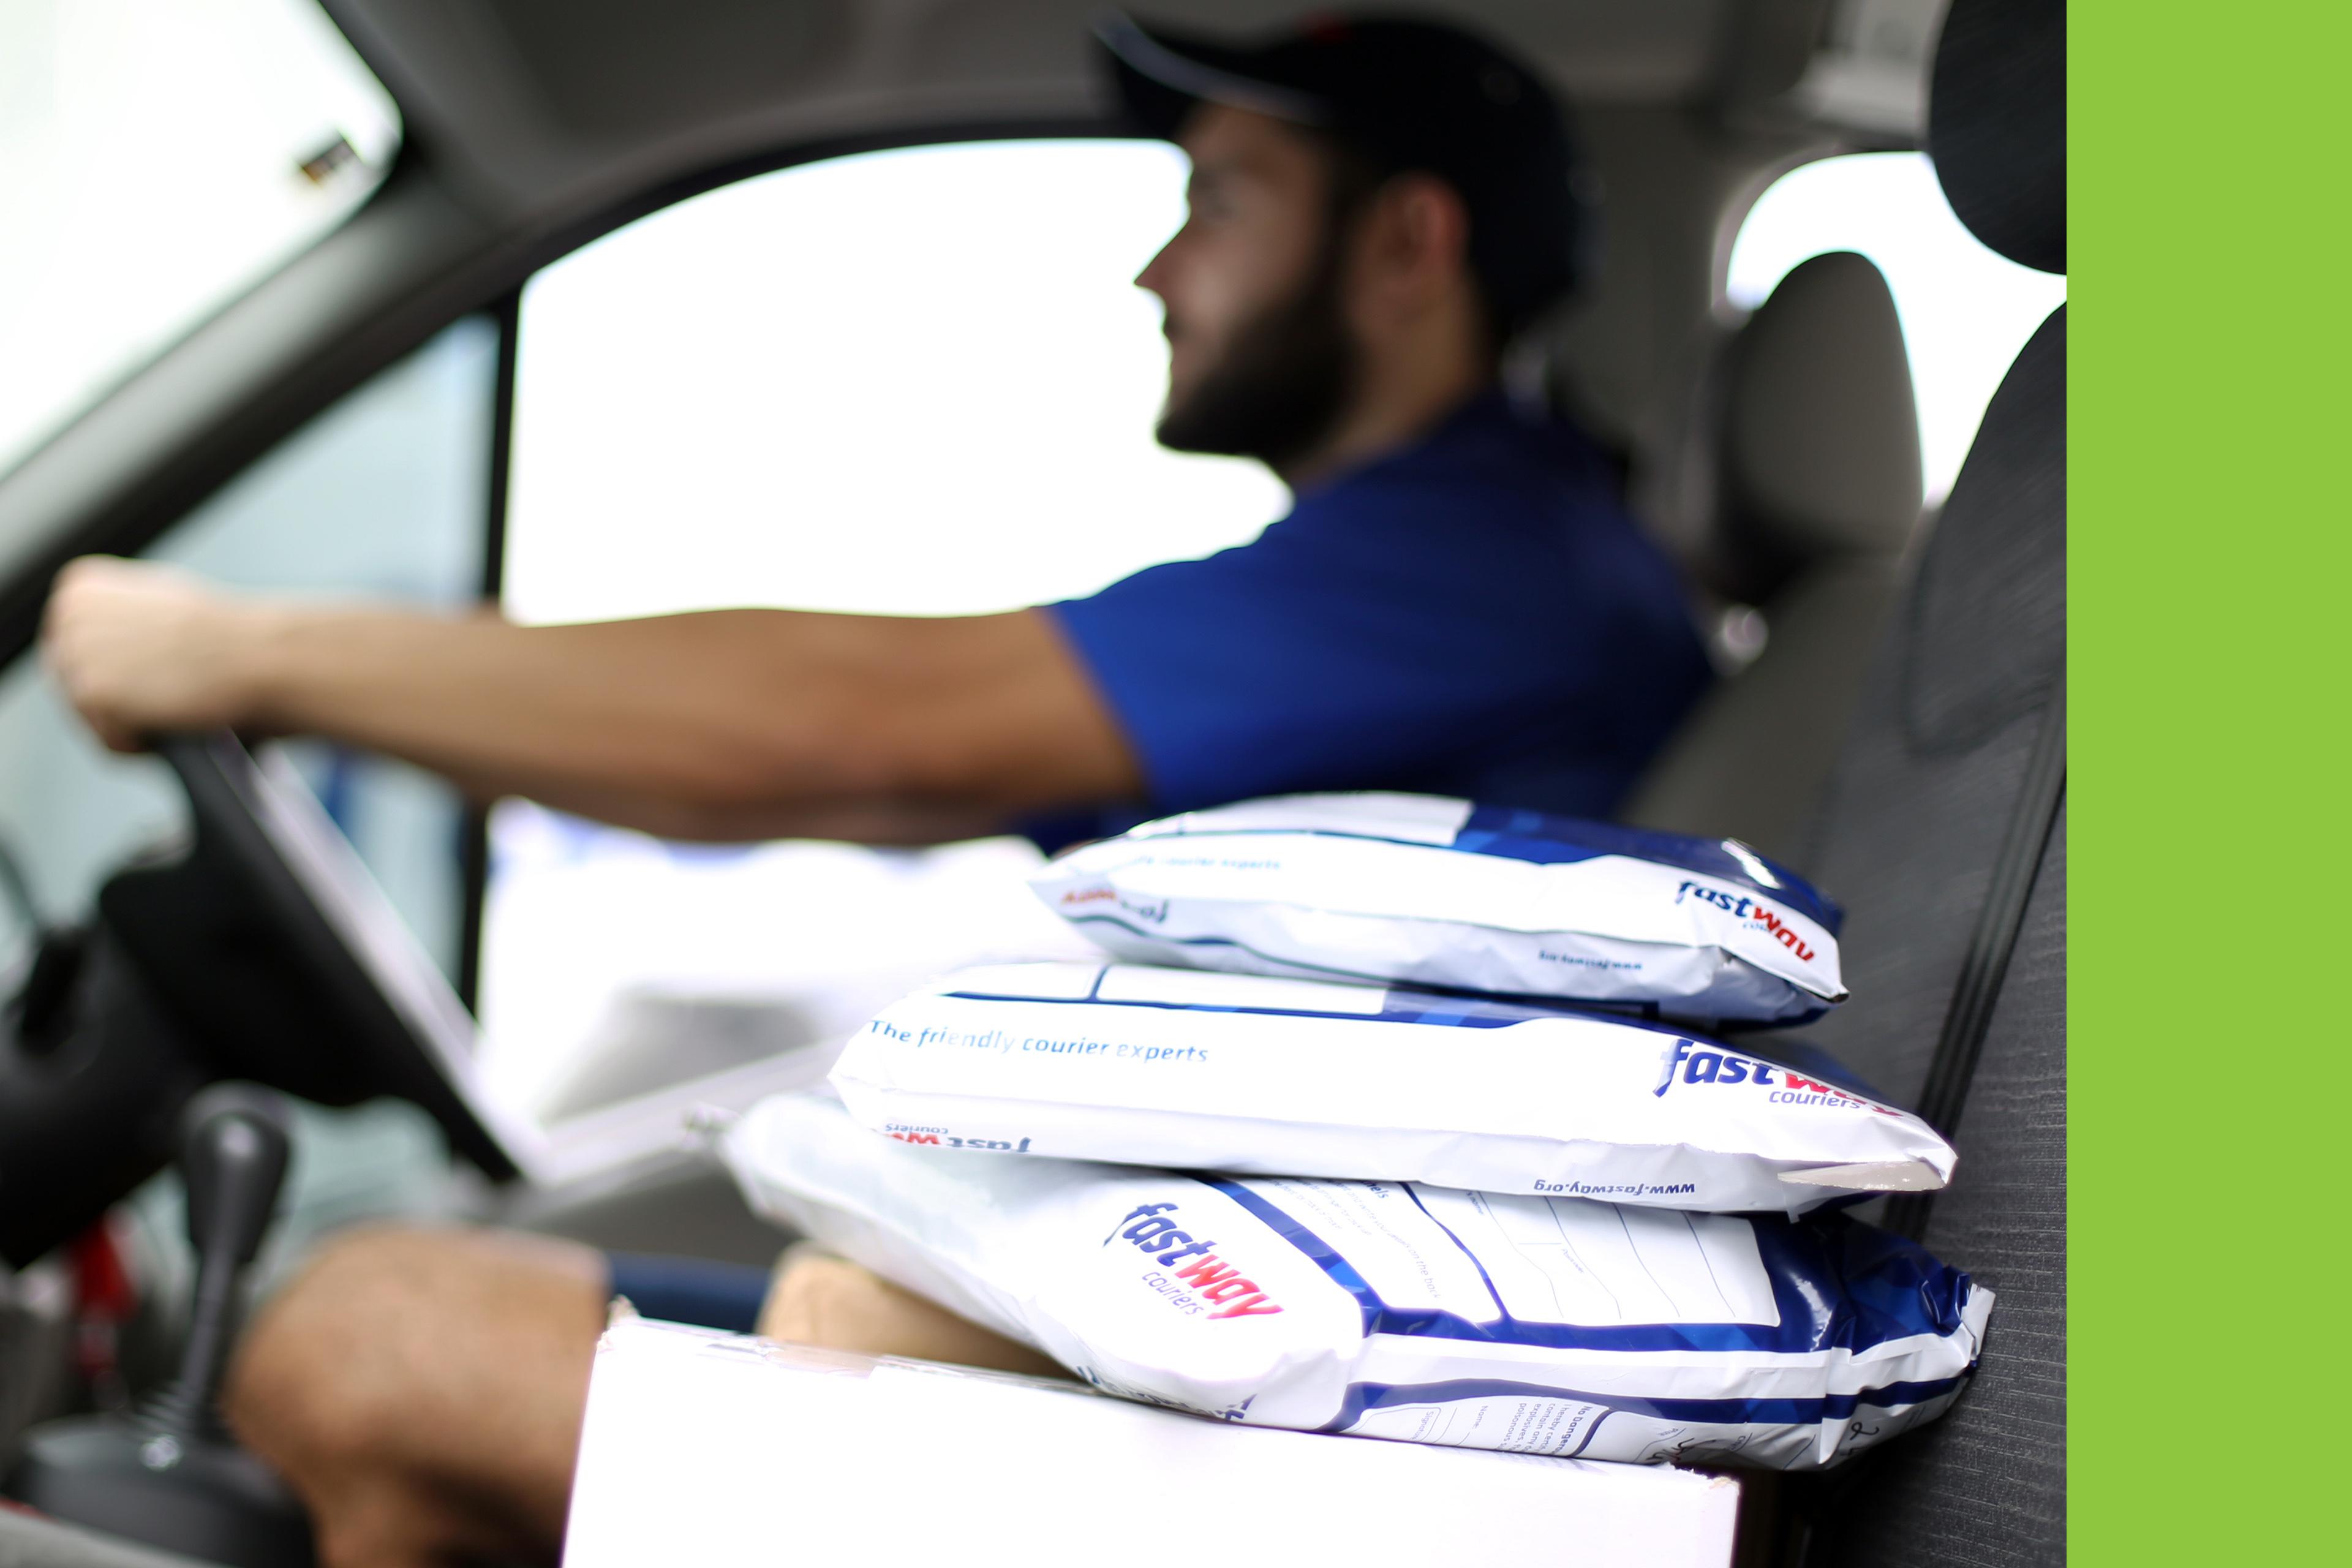 Courier Franchise business in transport/logistics. Port Melbourne